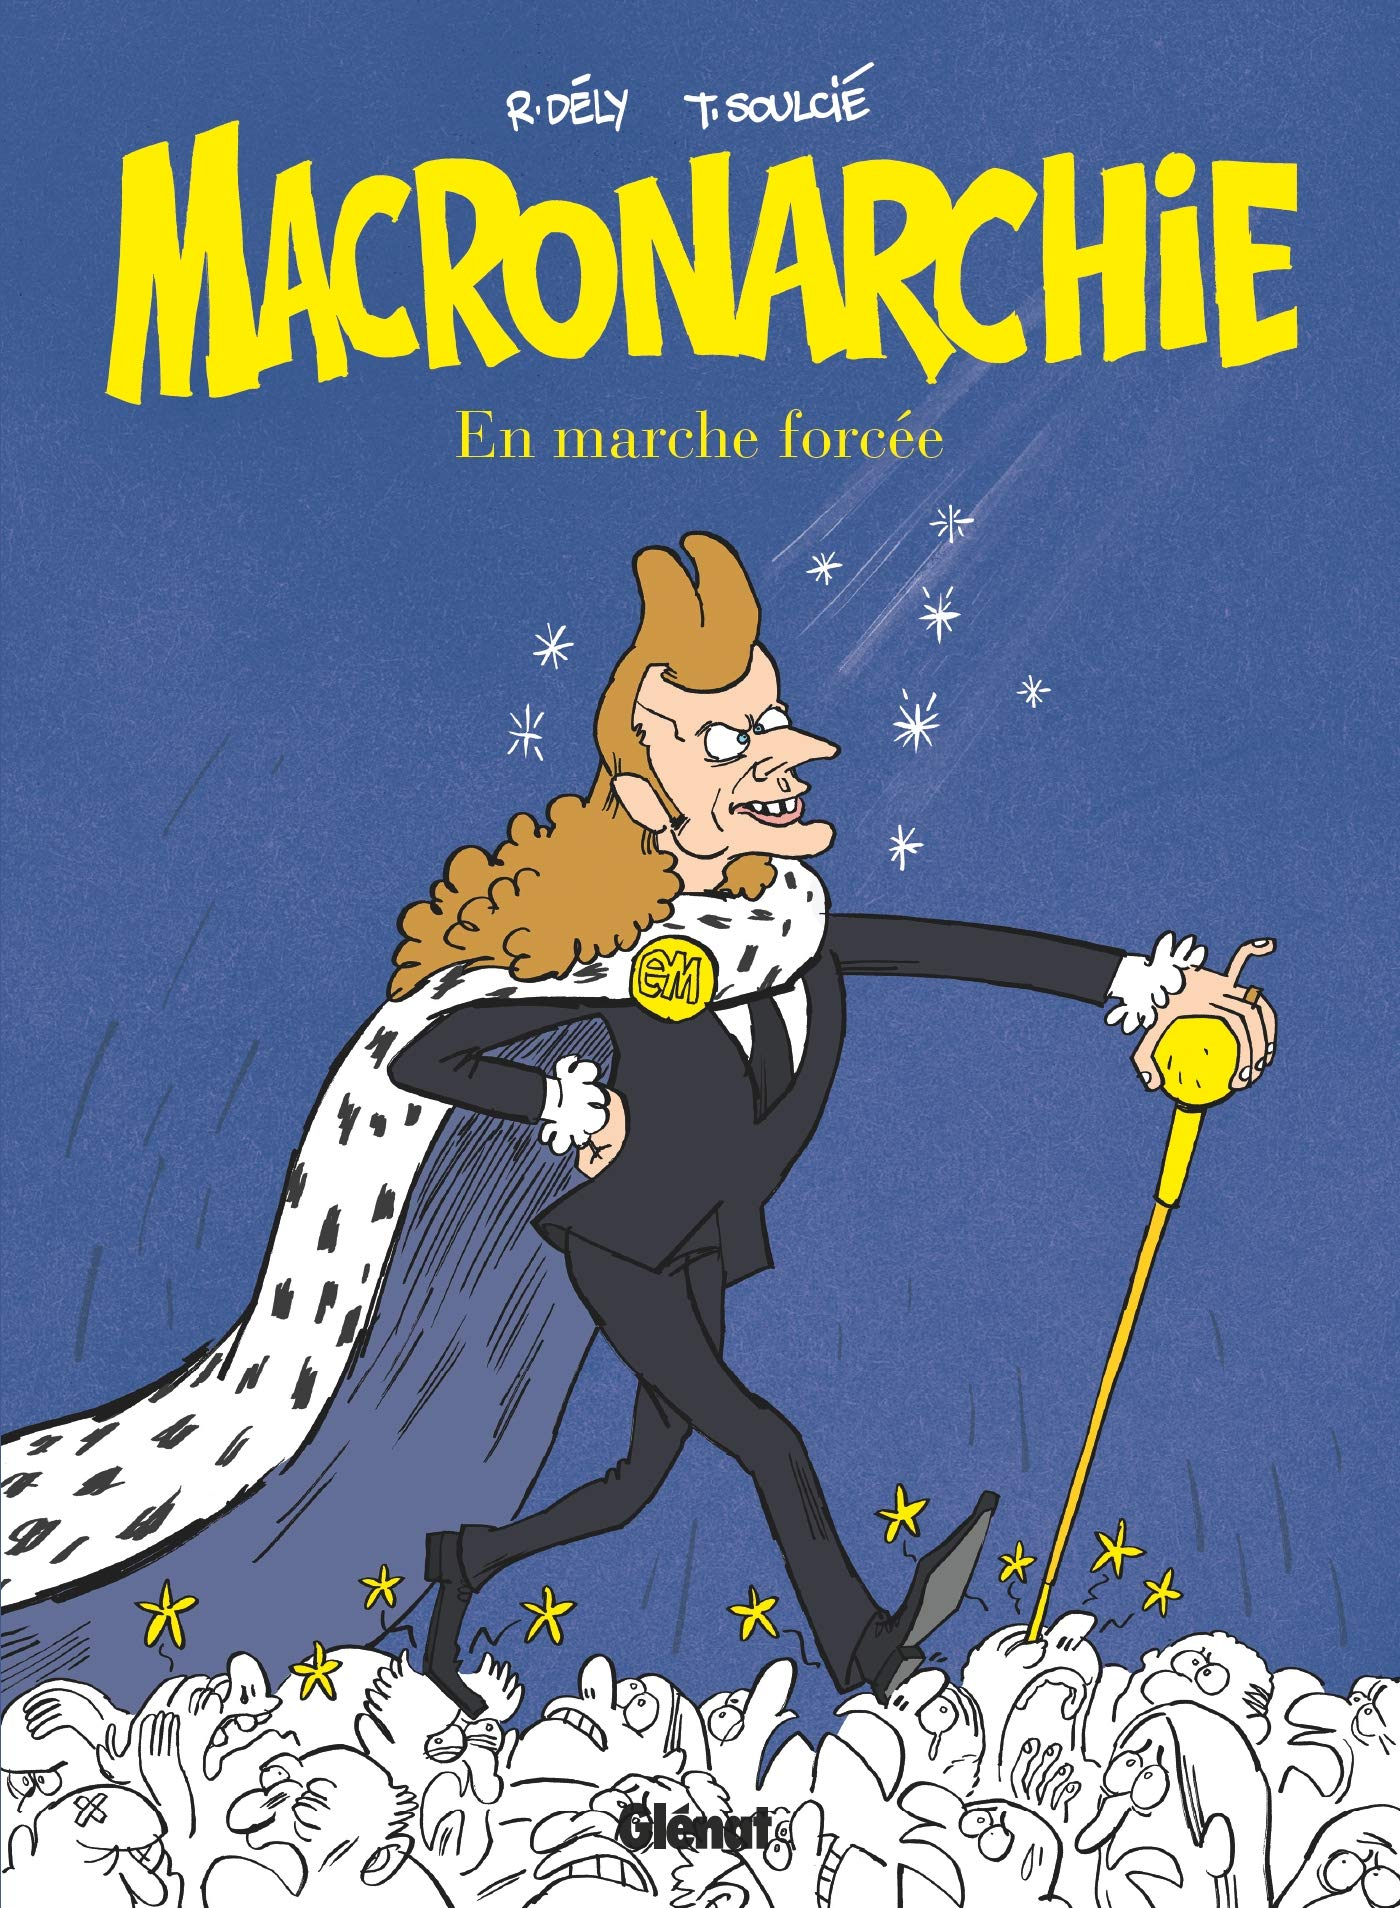 Macronarchie